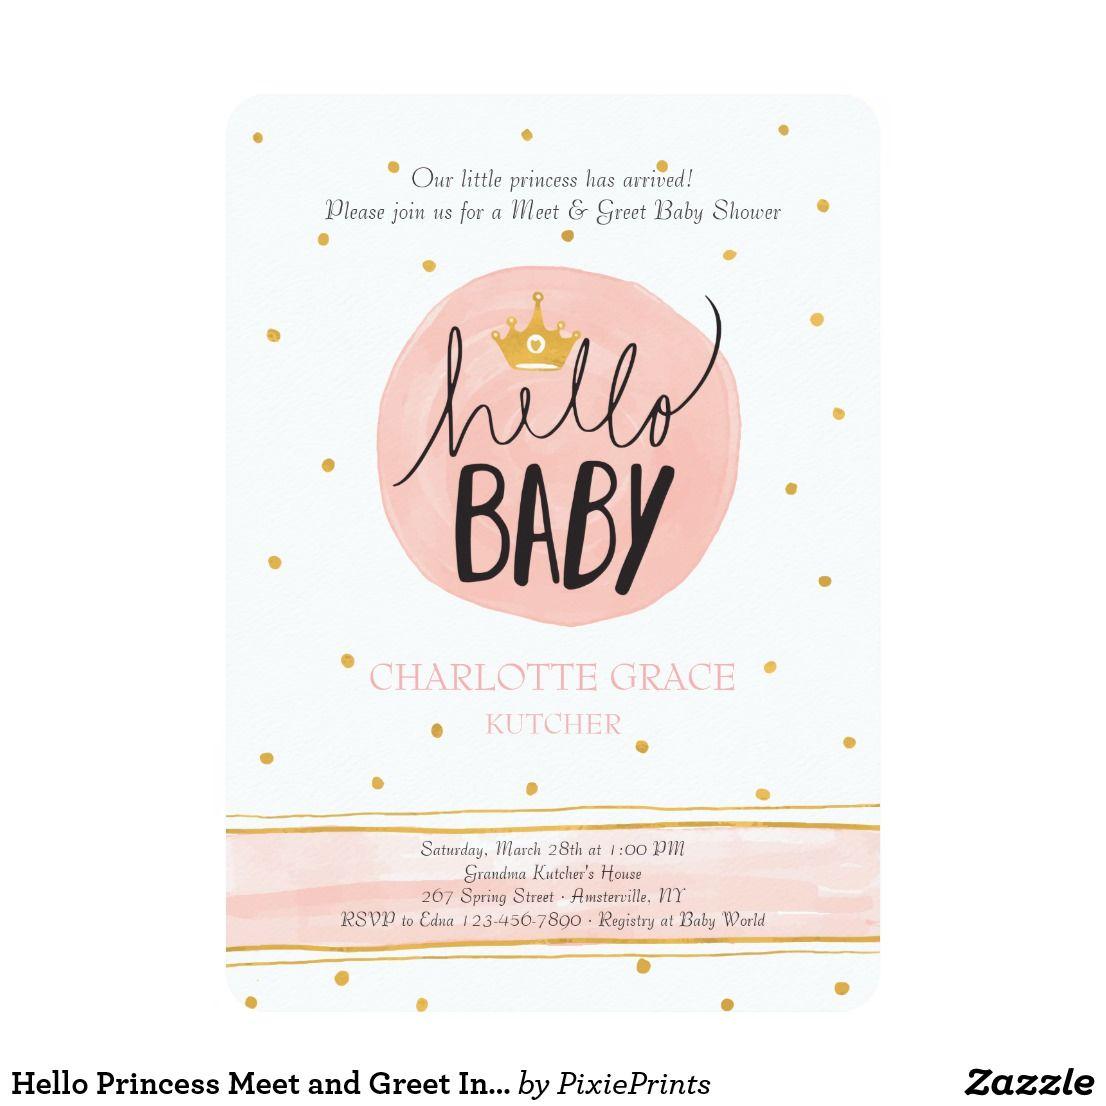 Hello Princess Meet and Greet Invitation | Zazzle.com | Baby shower  invitation wording, Baby shower invitations for boys, Personalized baby  shower invitations